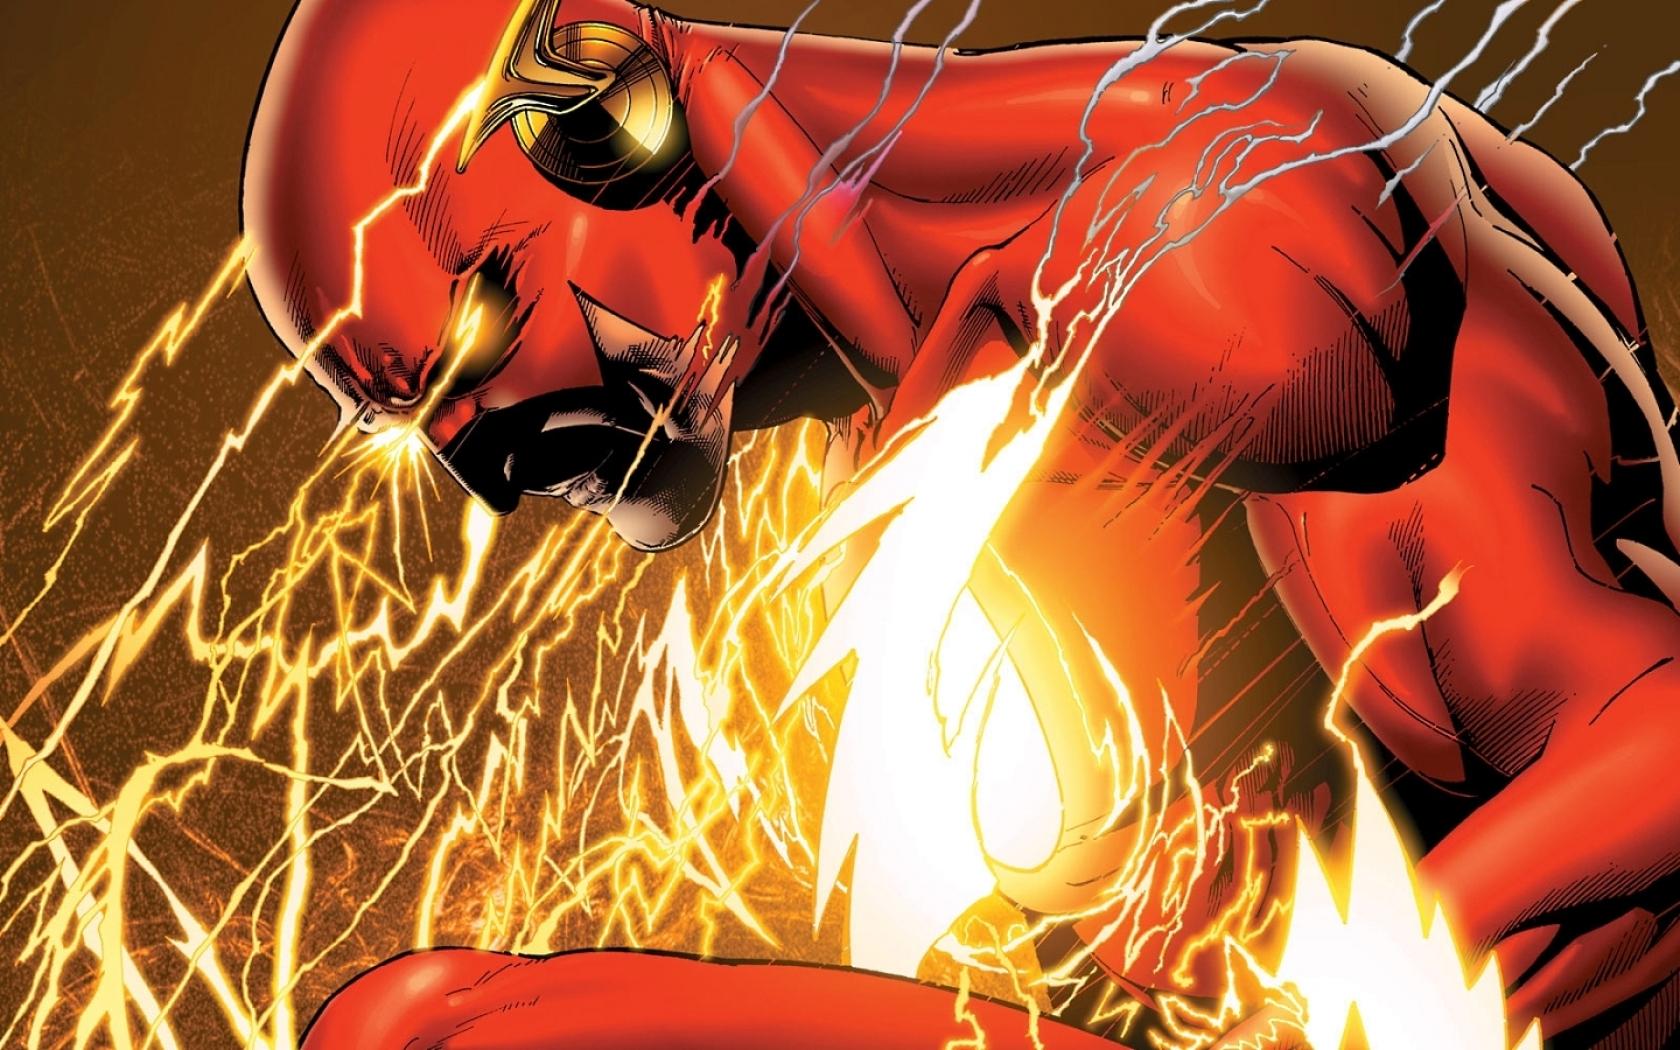 dc_comics_comics_the_flash_flash_comic_hero_1440x900_wallpaper_Art HD Wallpaper_1680x1050_www.animemay.com (1)